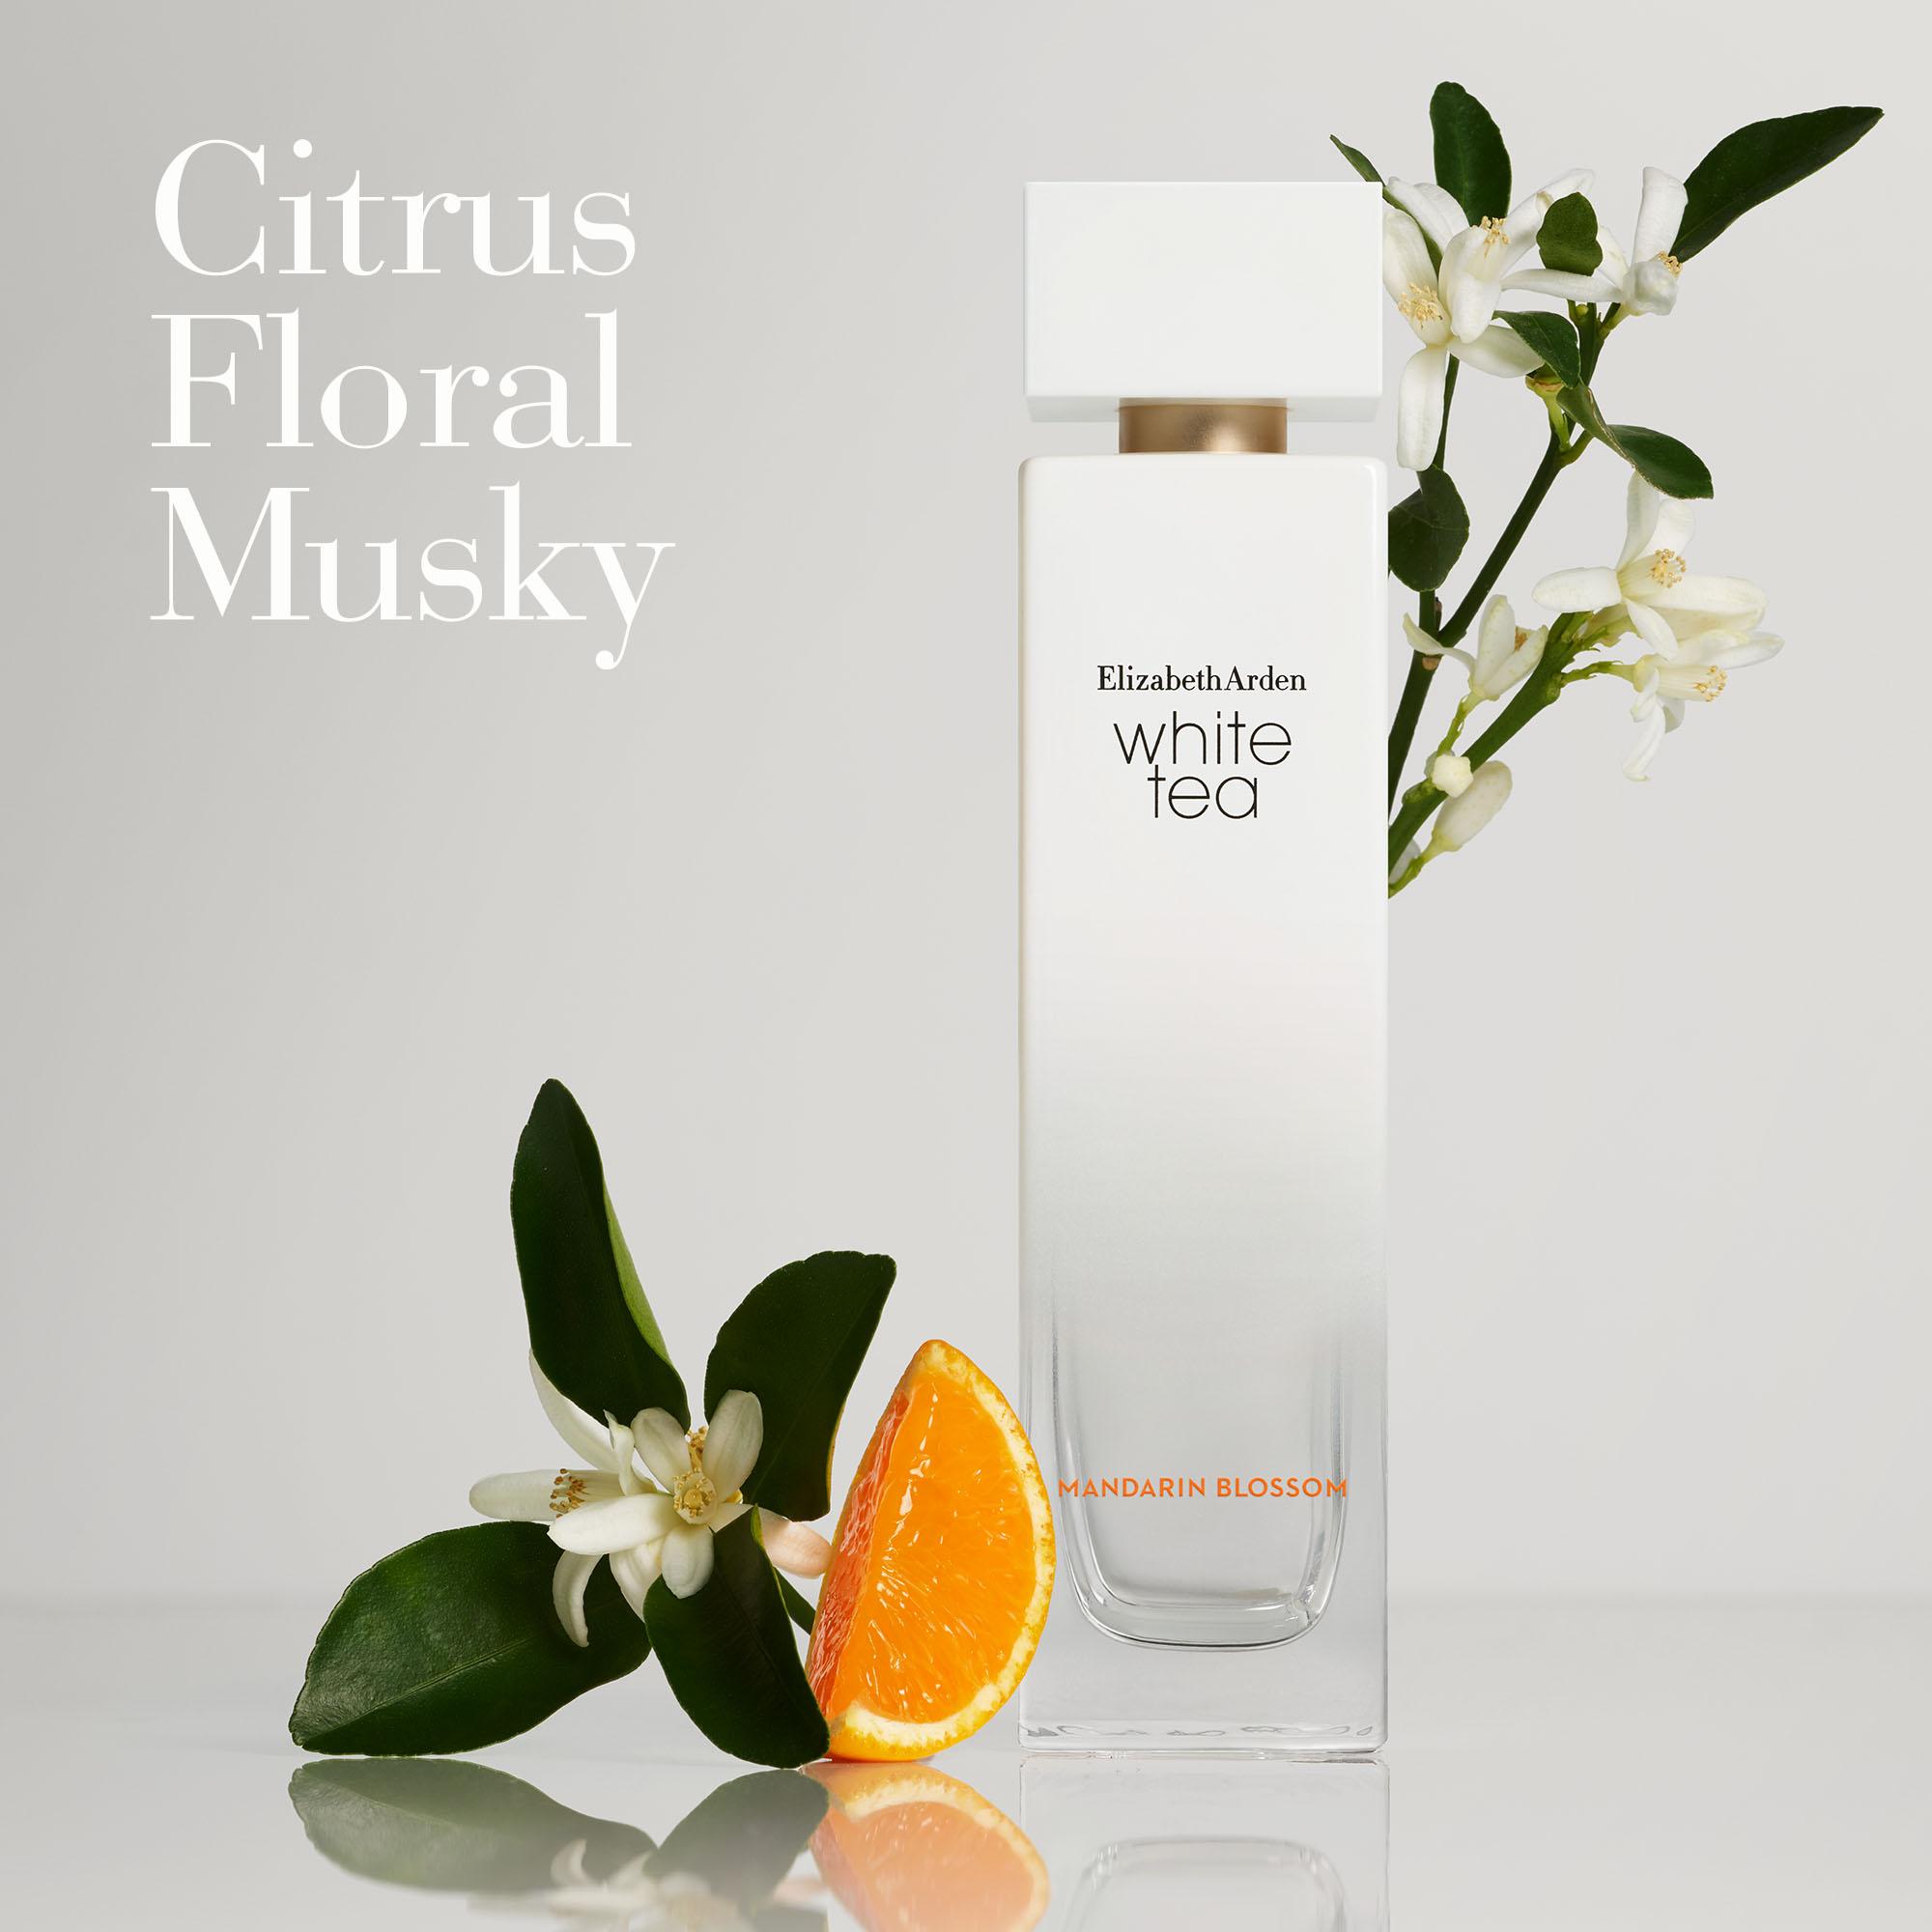 Olfactory: Citrus, Floral, Musky